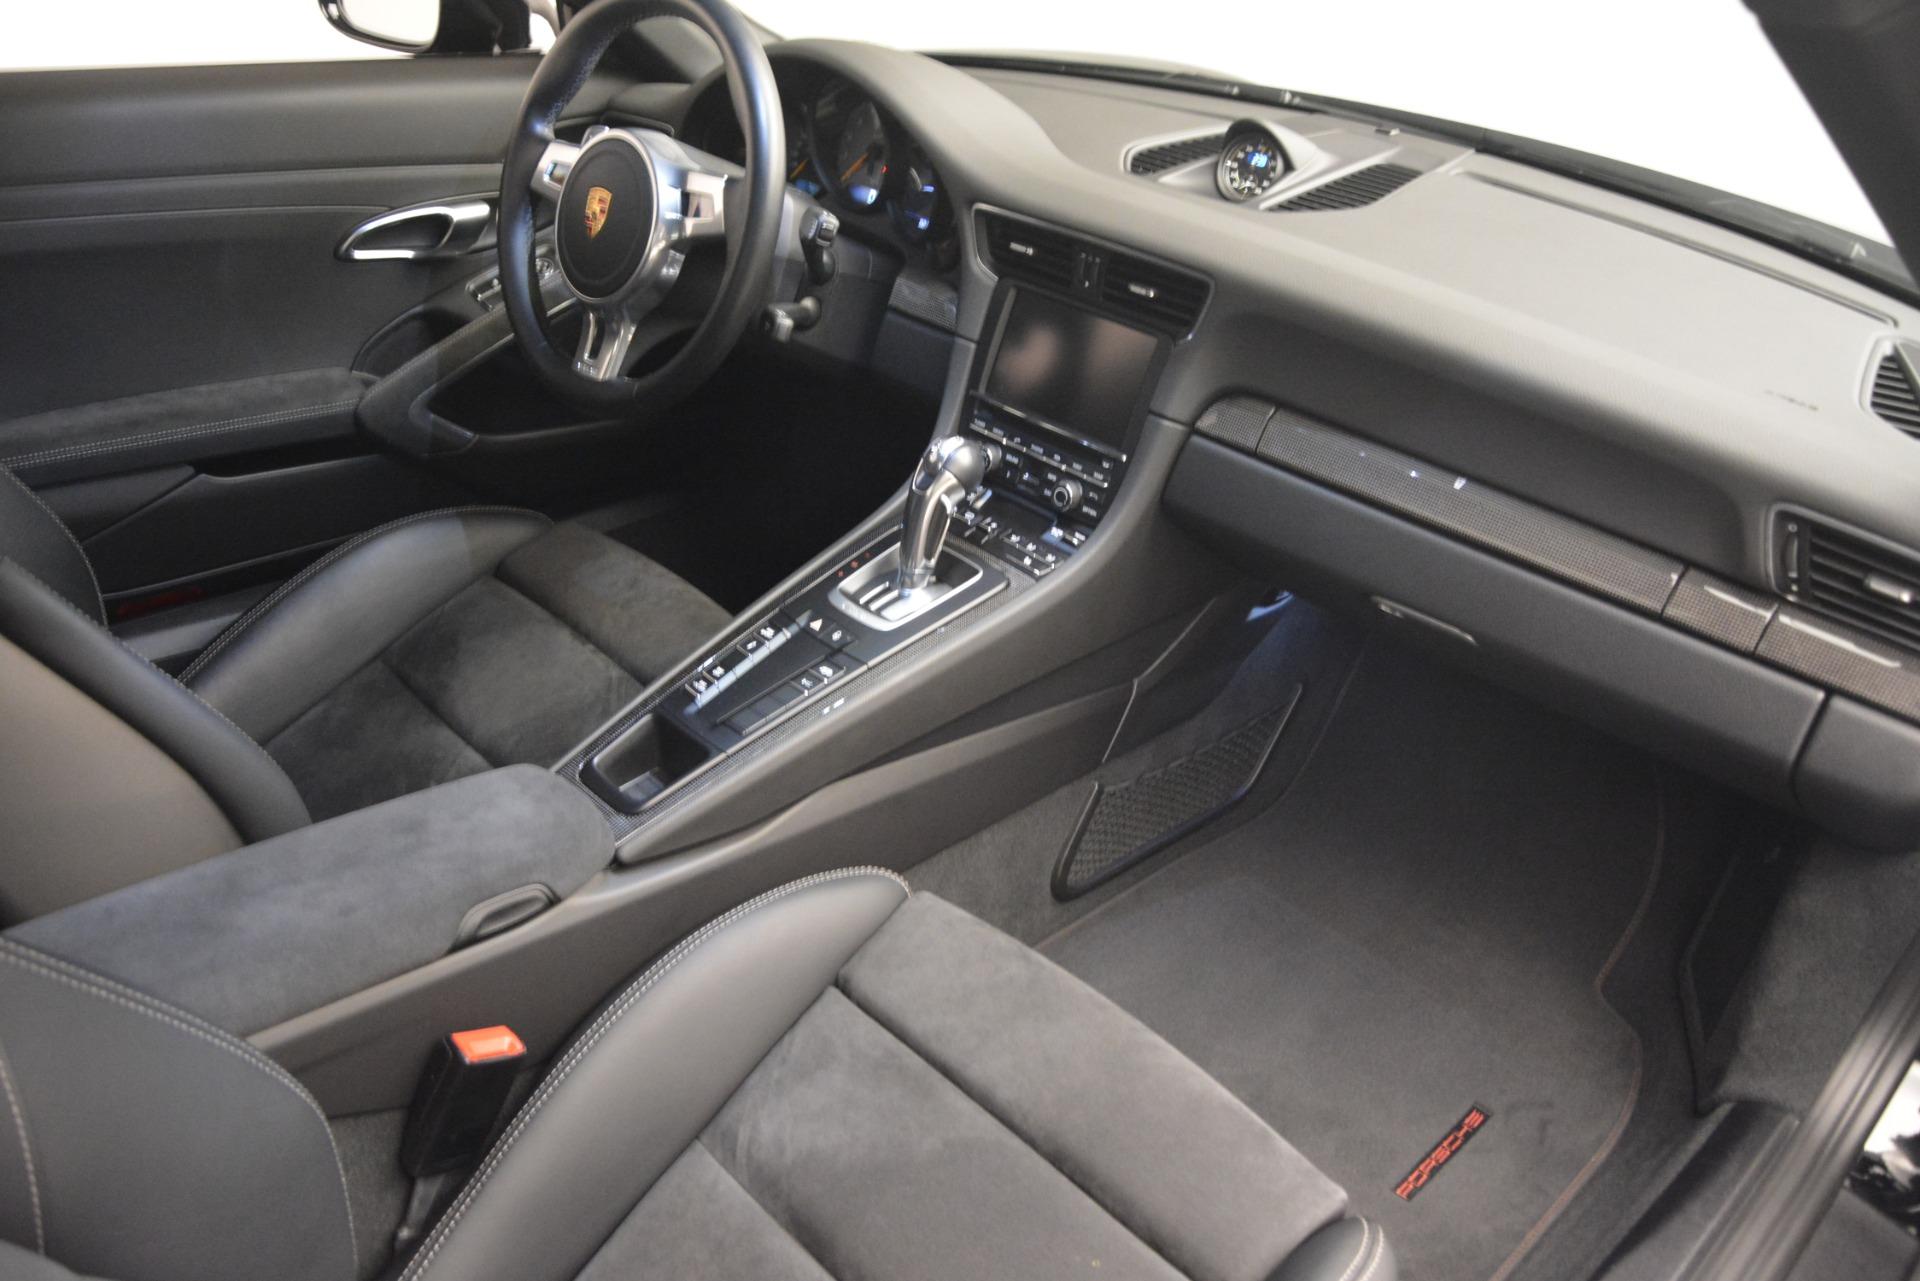 Used 2015 Porsche 911 GT3 For Sale In Greenwich, CT. Alfa Romeo of Greenwich, 7516 3009_p19